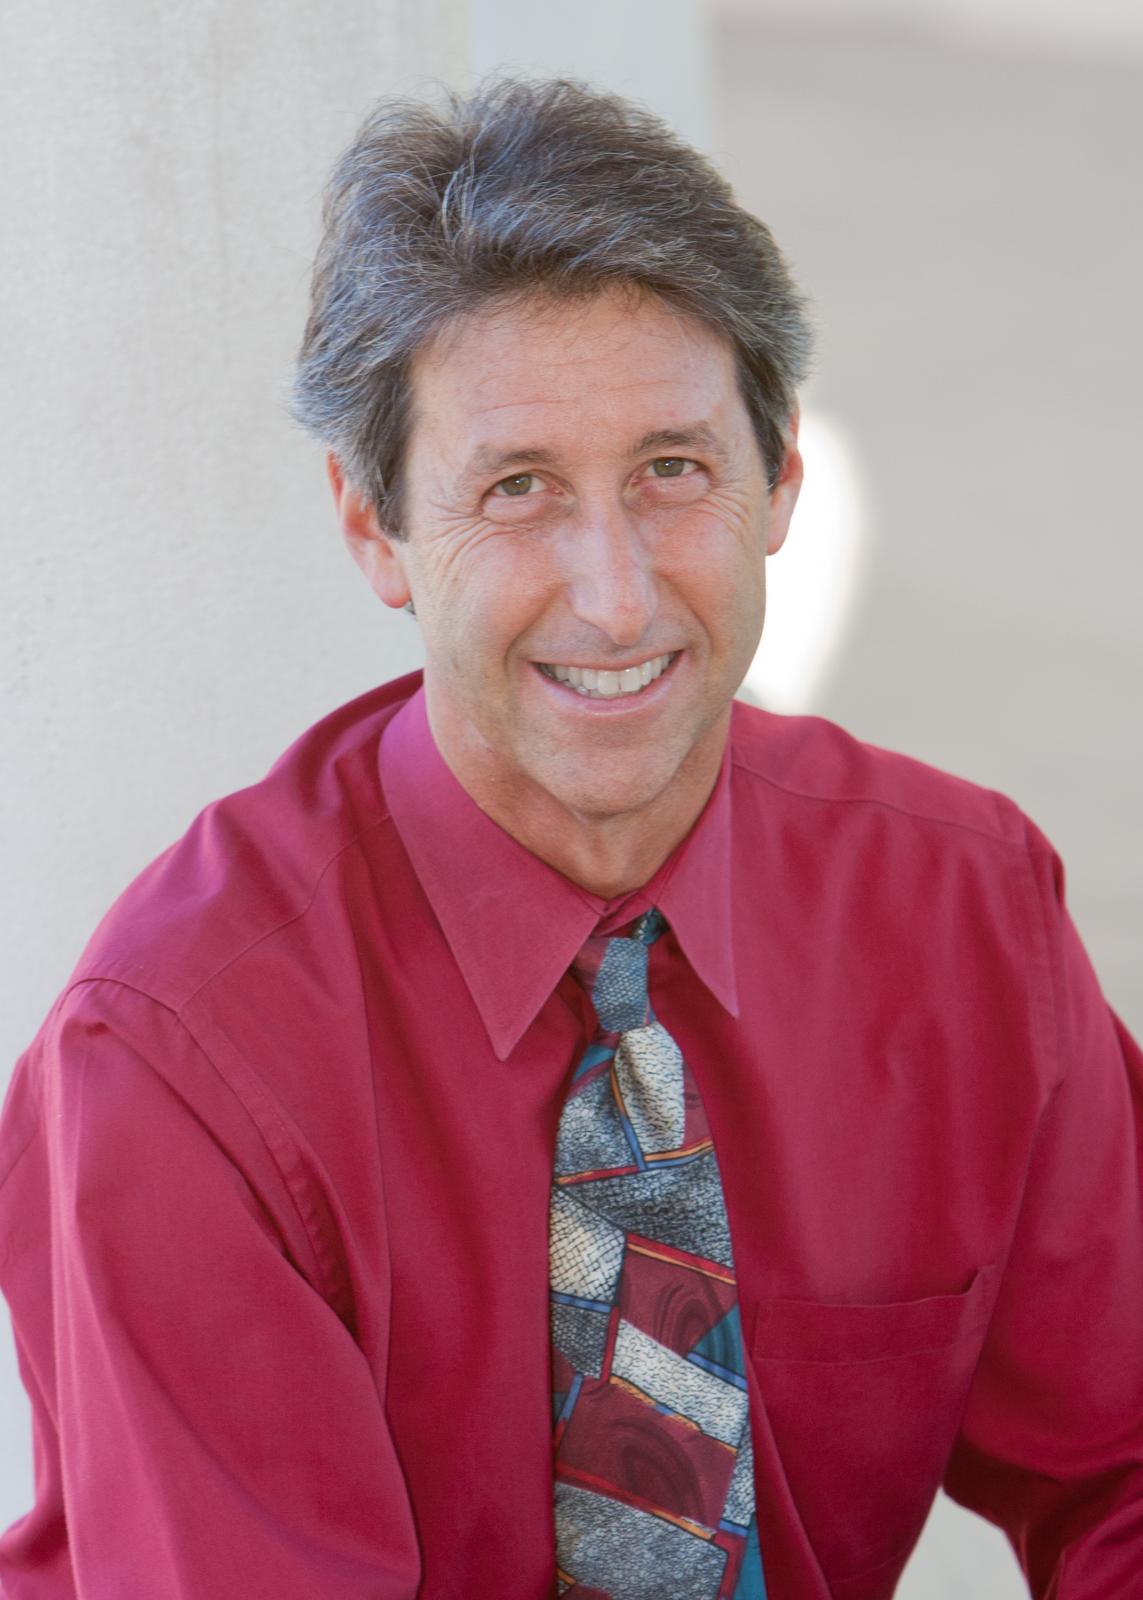 Michael Shames